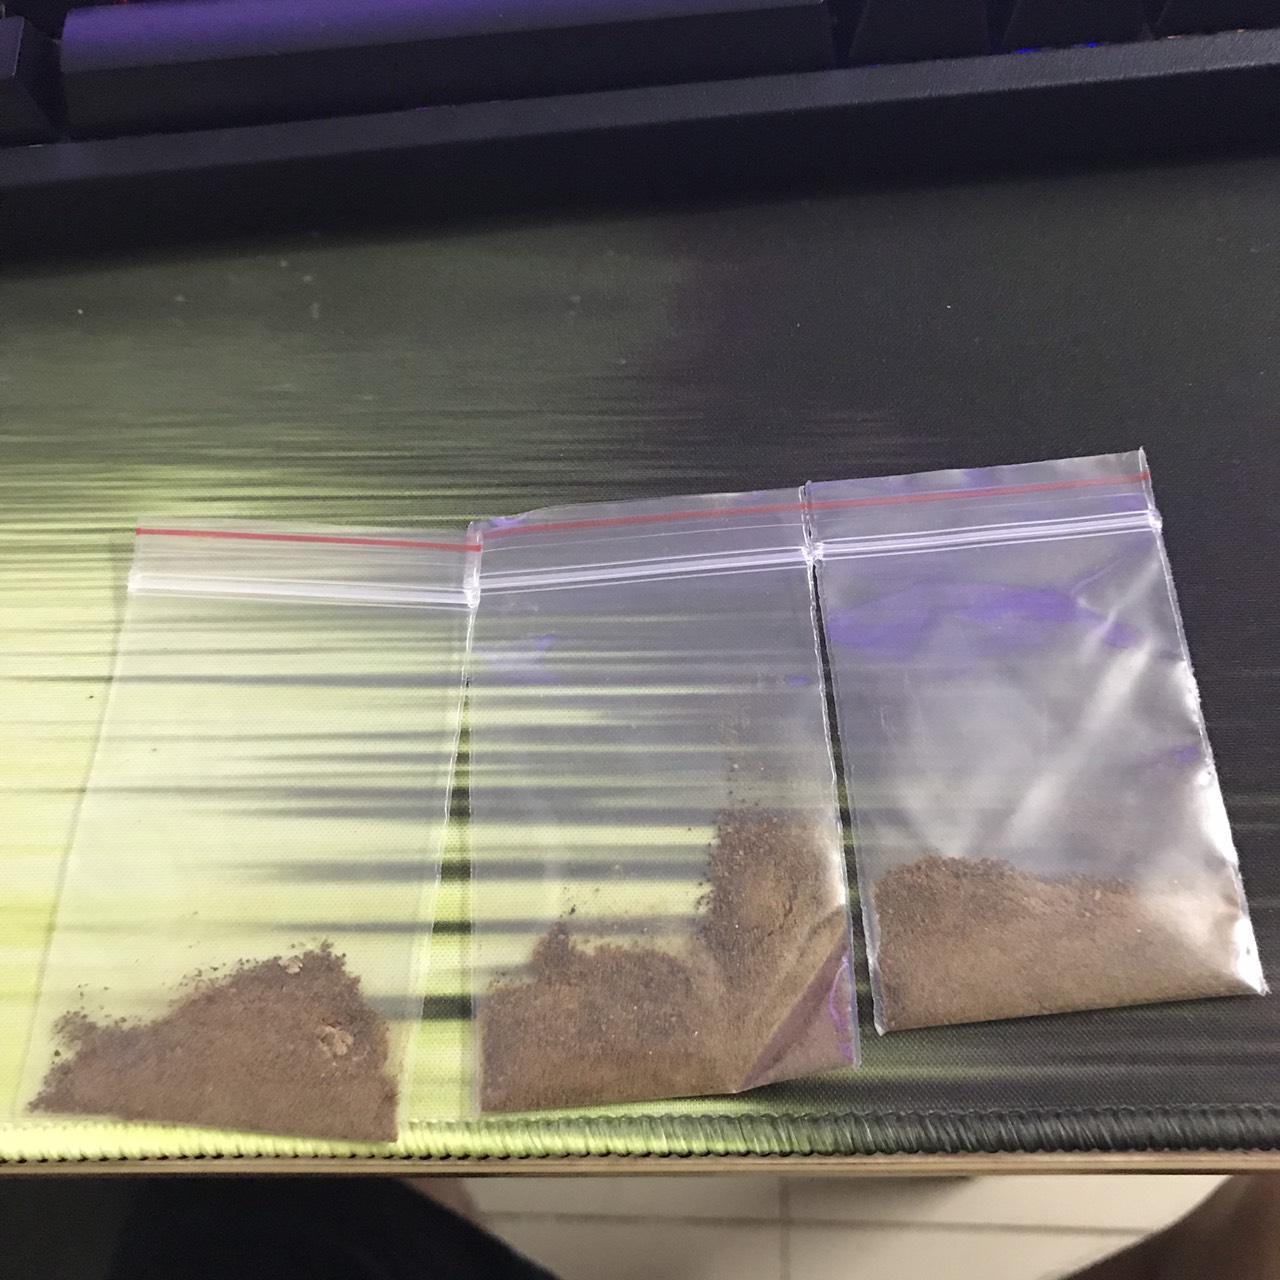 Sìn Sú Gói Lớn - Sìn Đen - 320k 1 Gram cao cấp